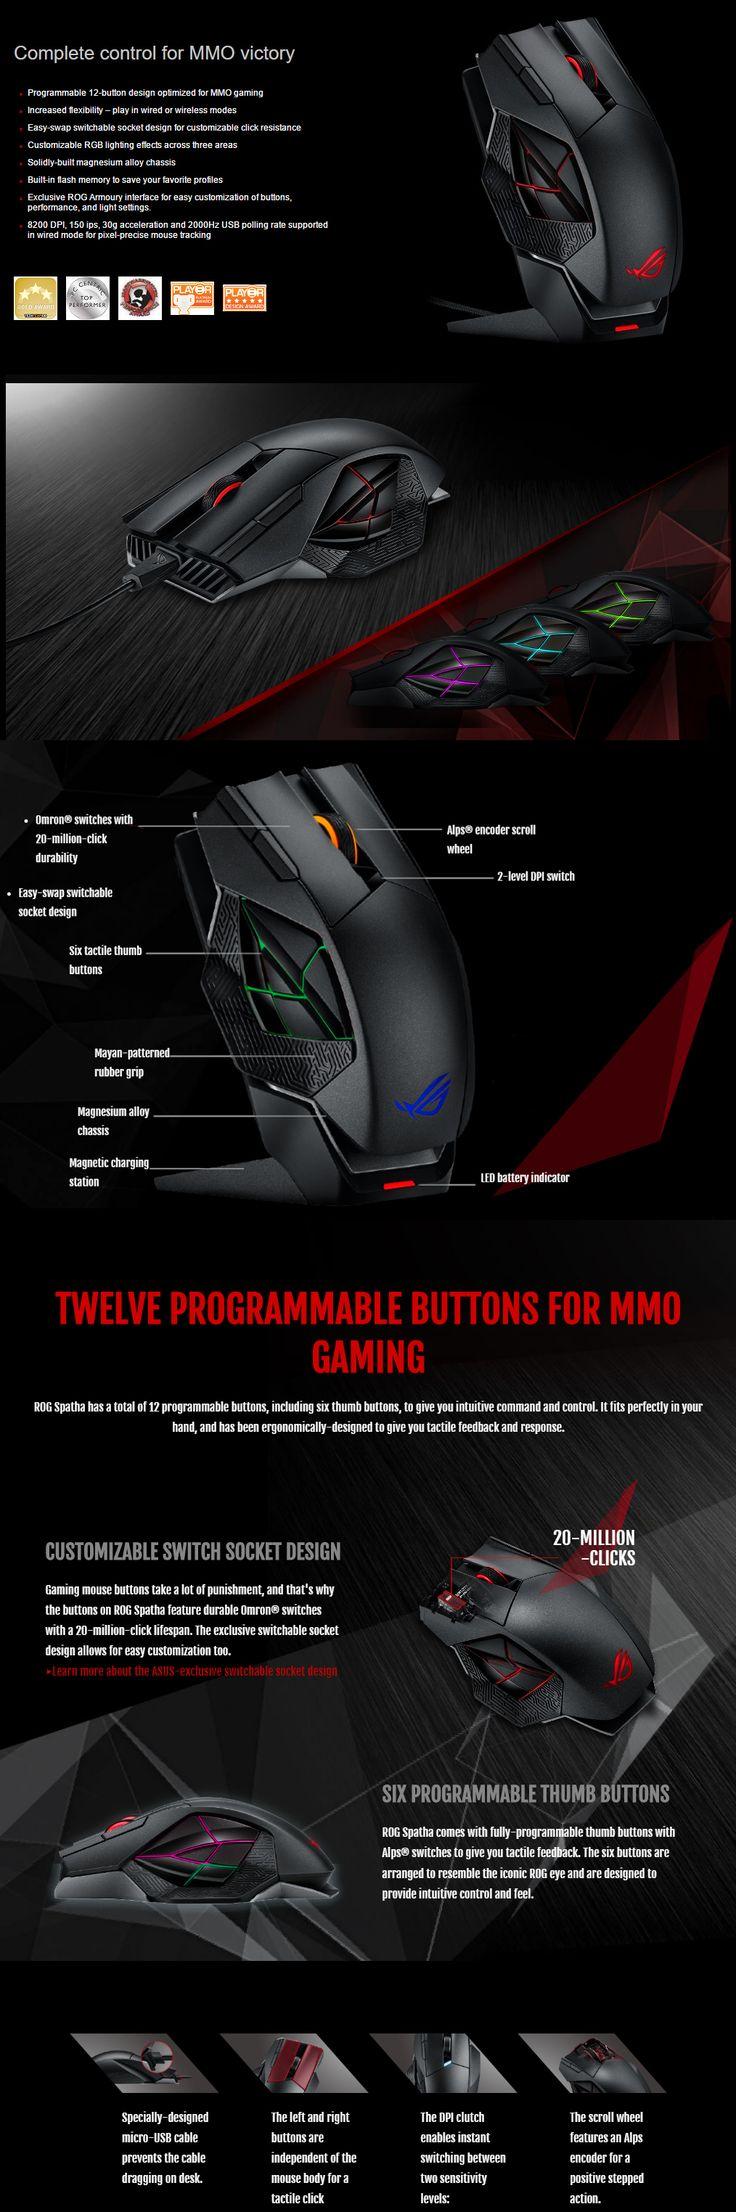 ASUS SPATHA Gaming Mouse - Computer Lounge